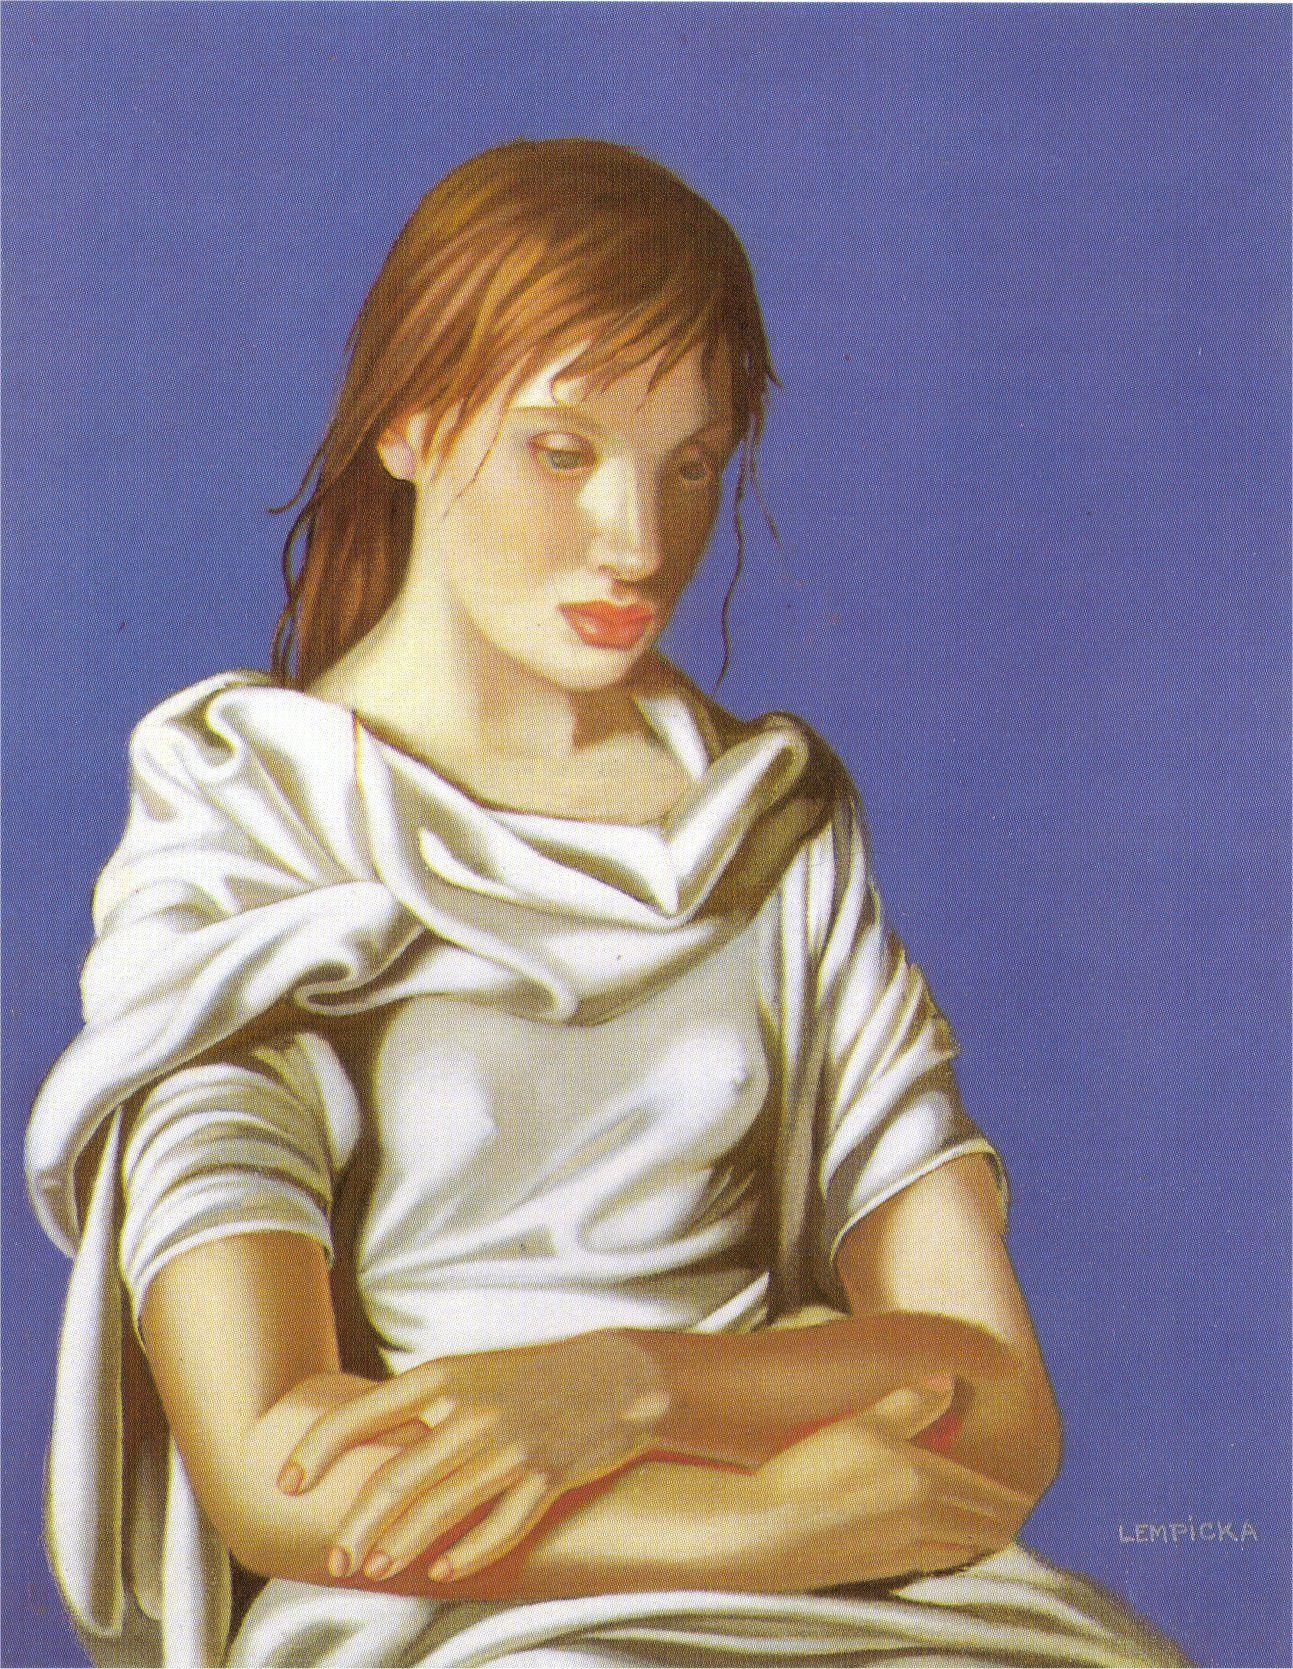 met-art-tamara-d Young Lady with Crossed Arms - Tamara de Lempicka 1939